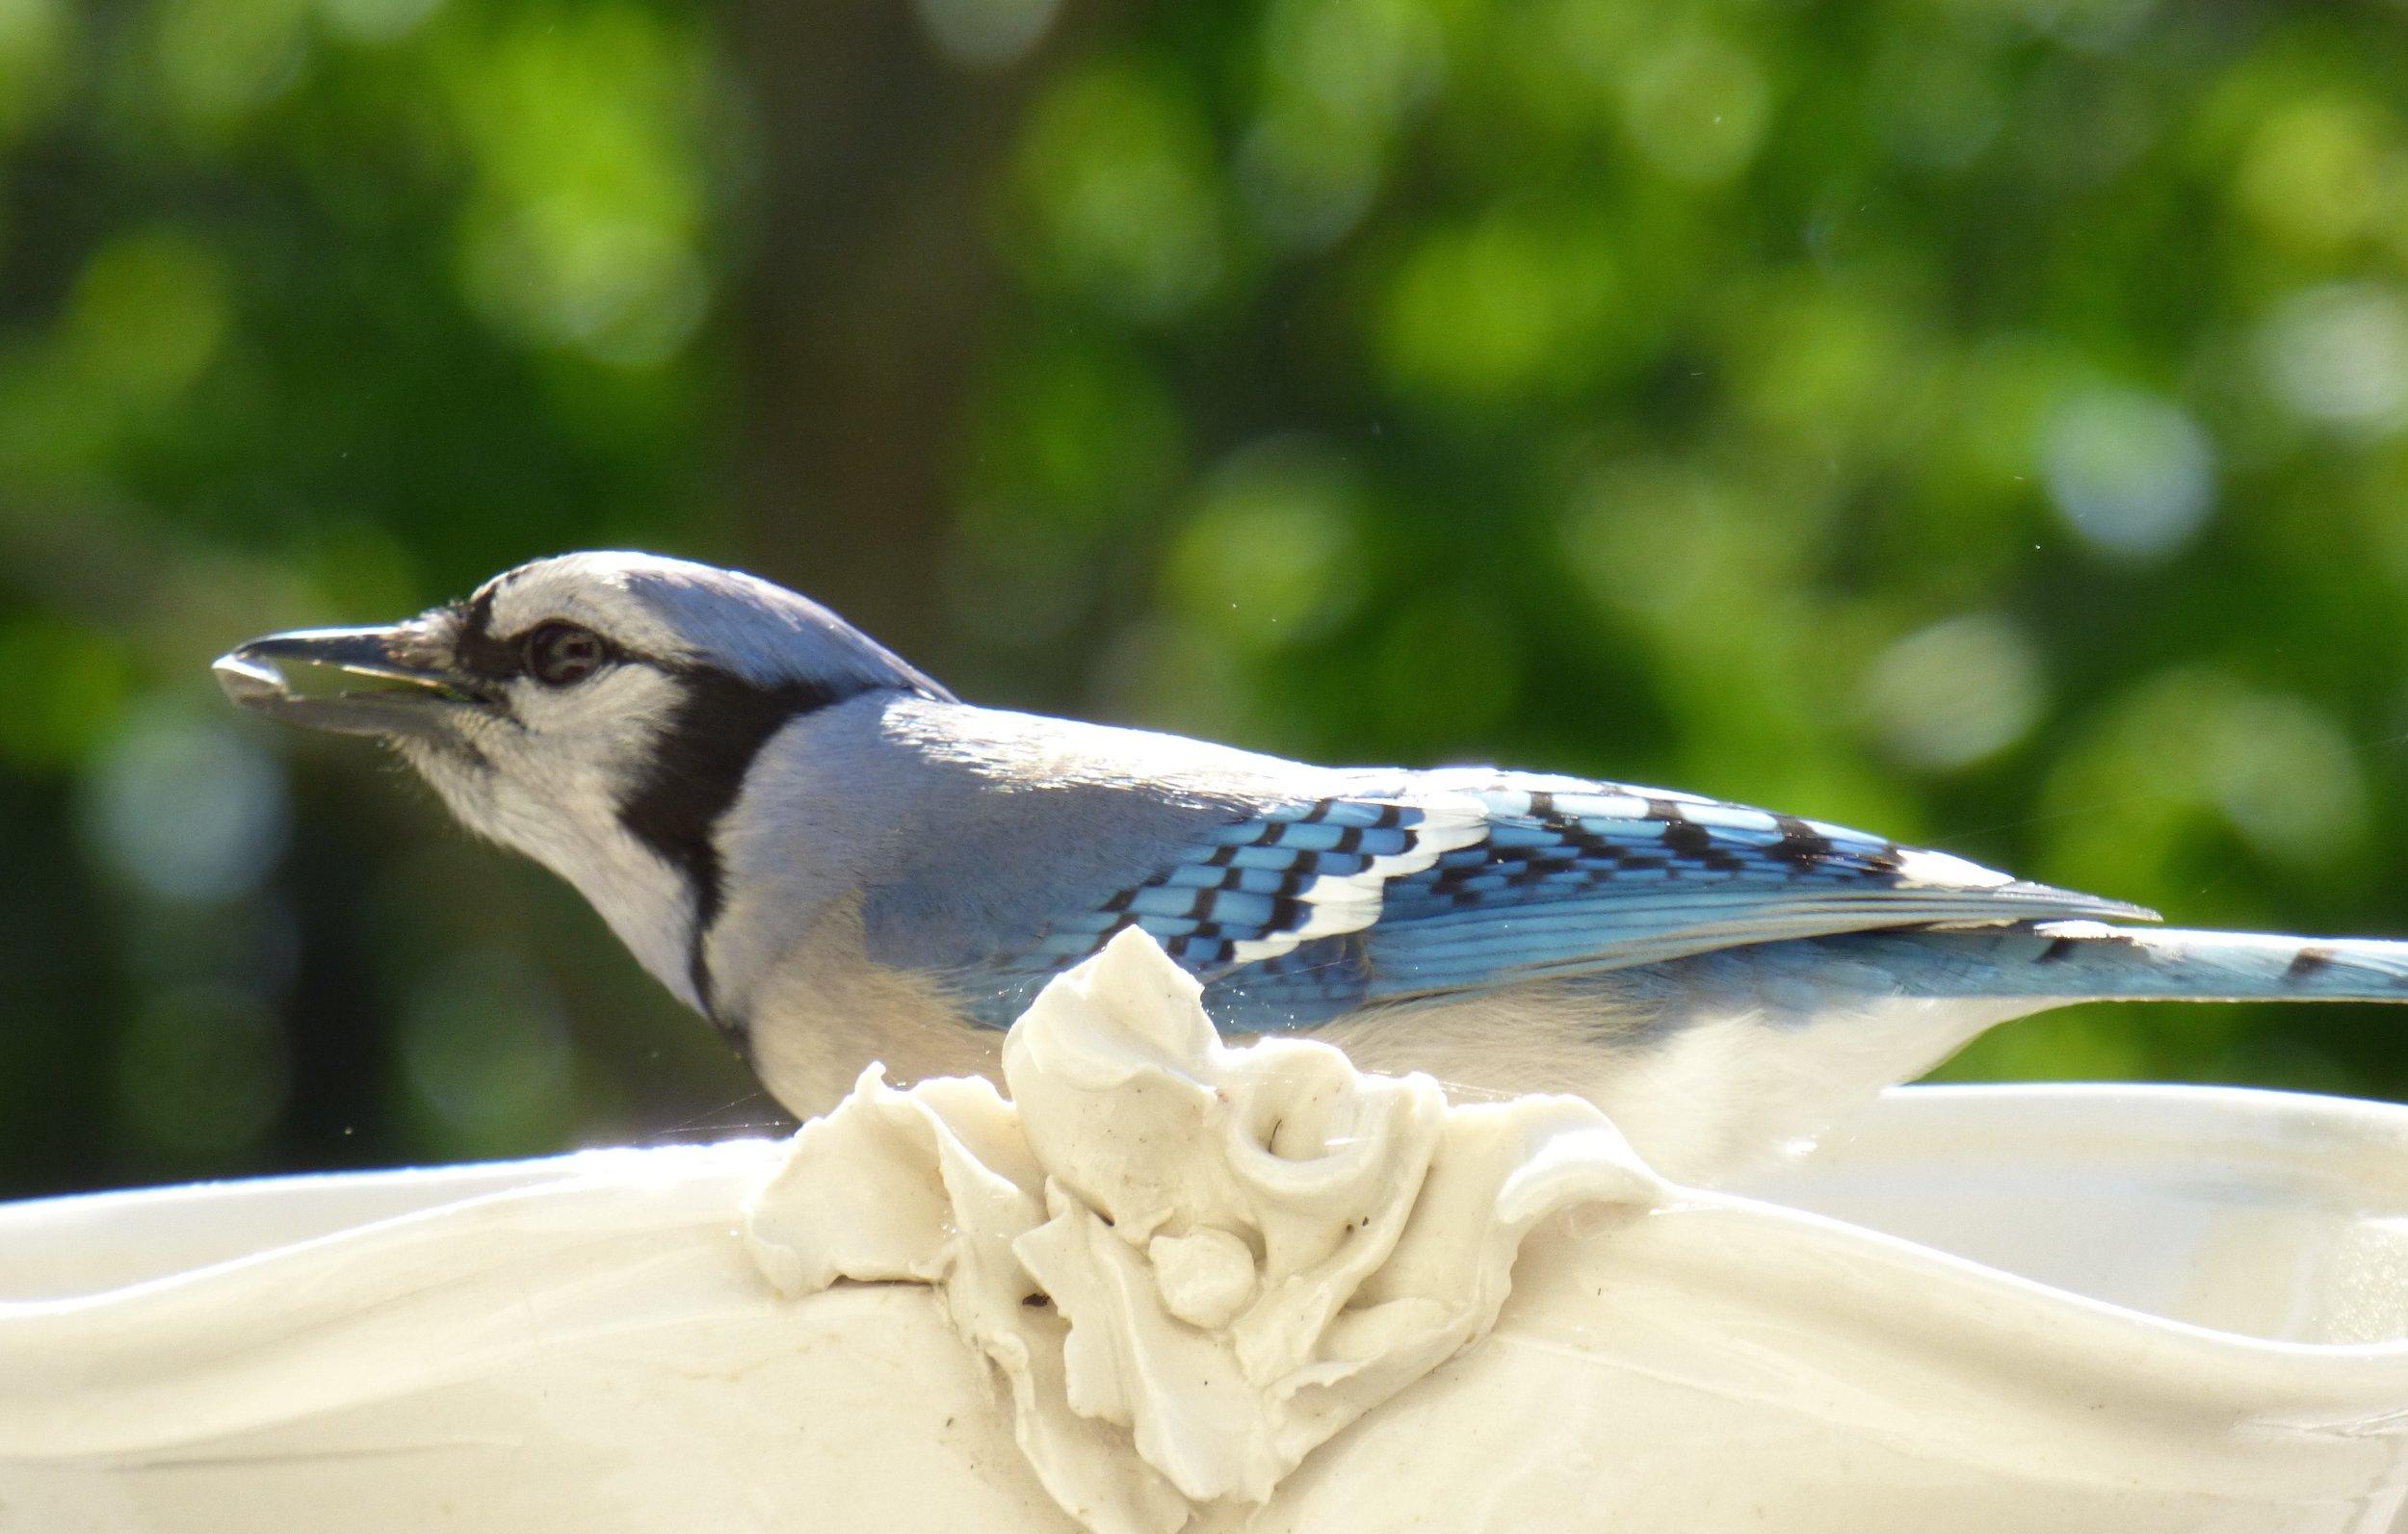 Blue jay feasting in one of my porcelain bird feeders